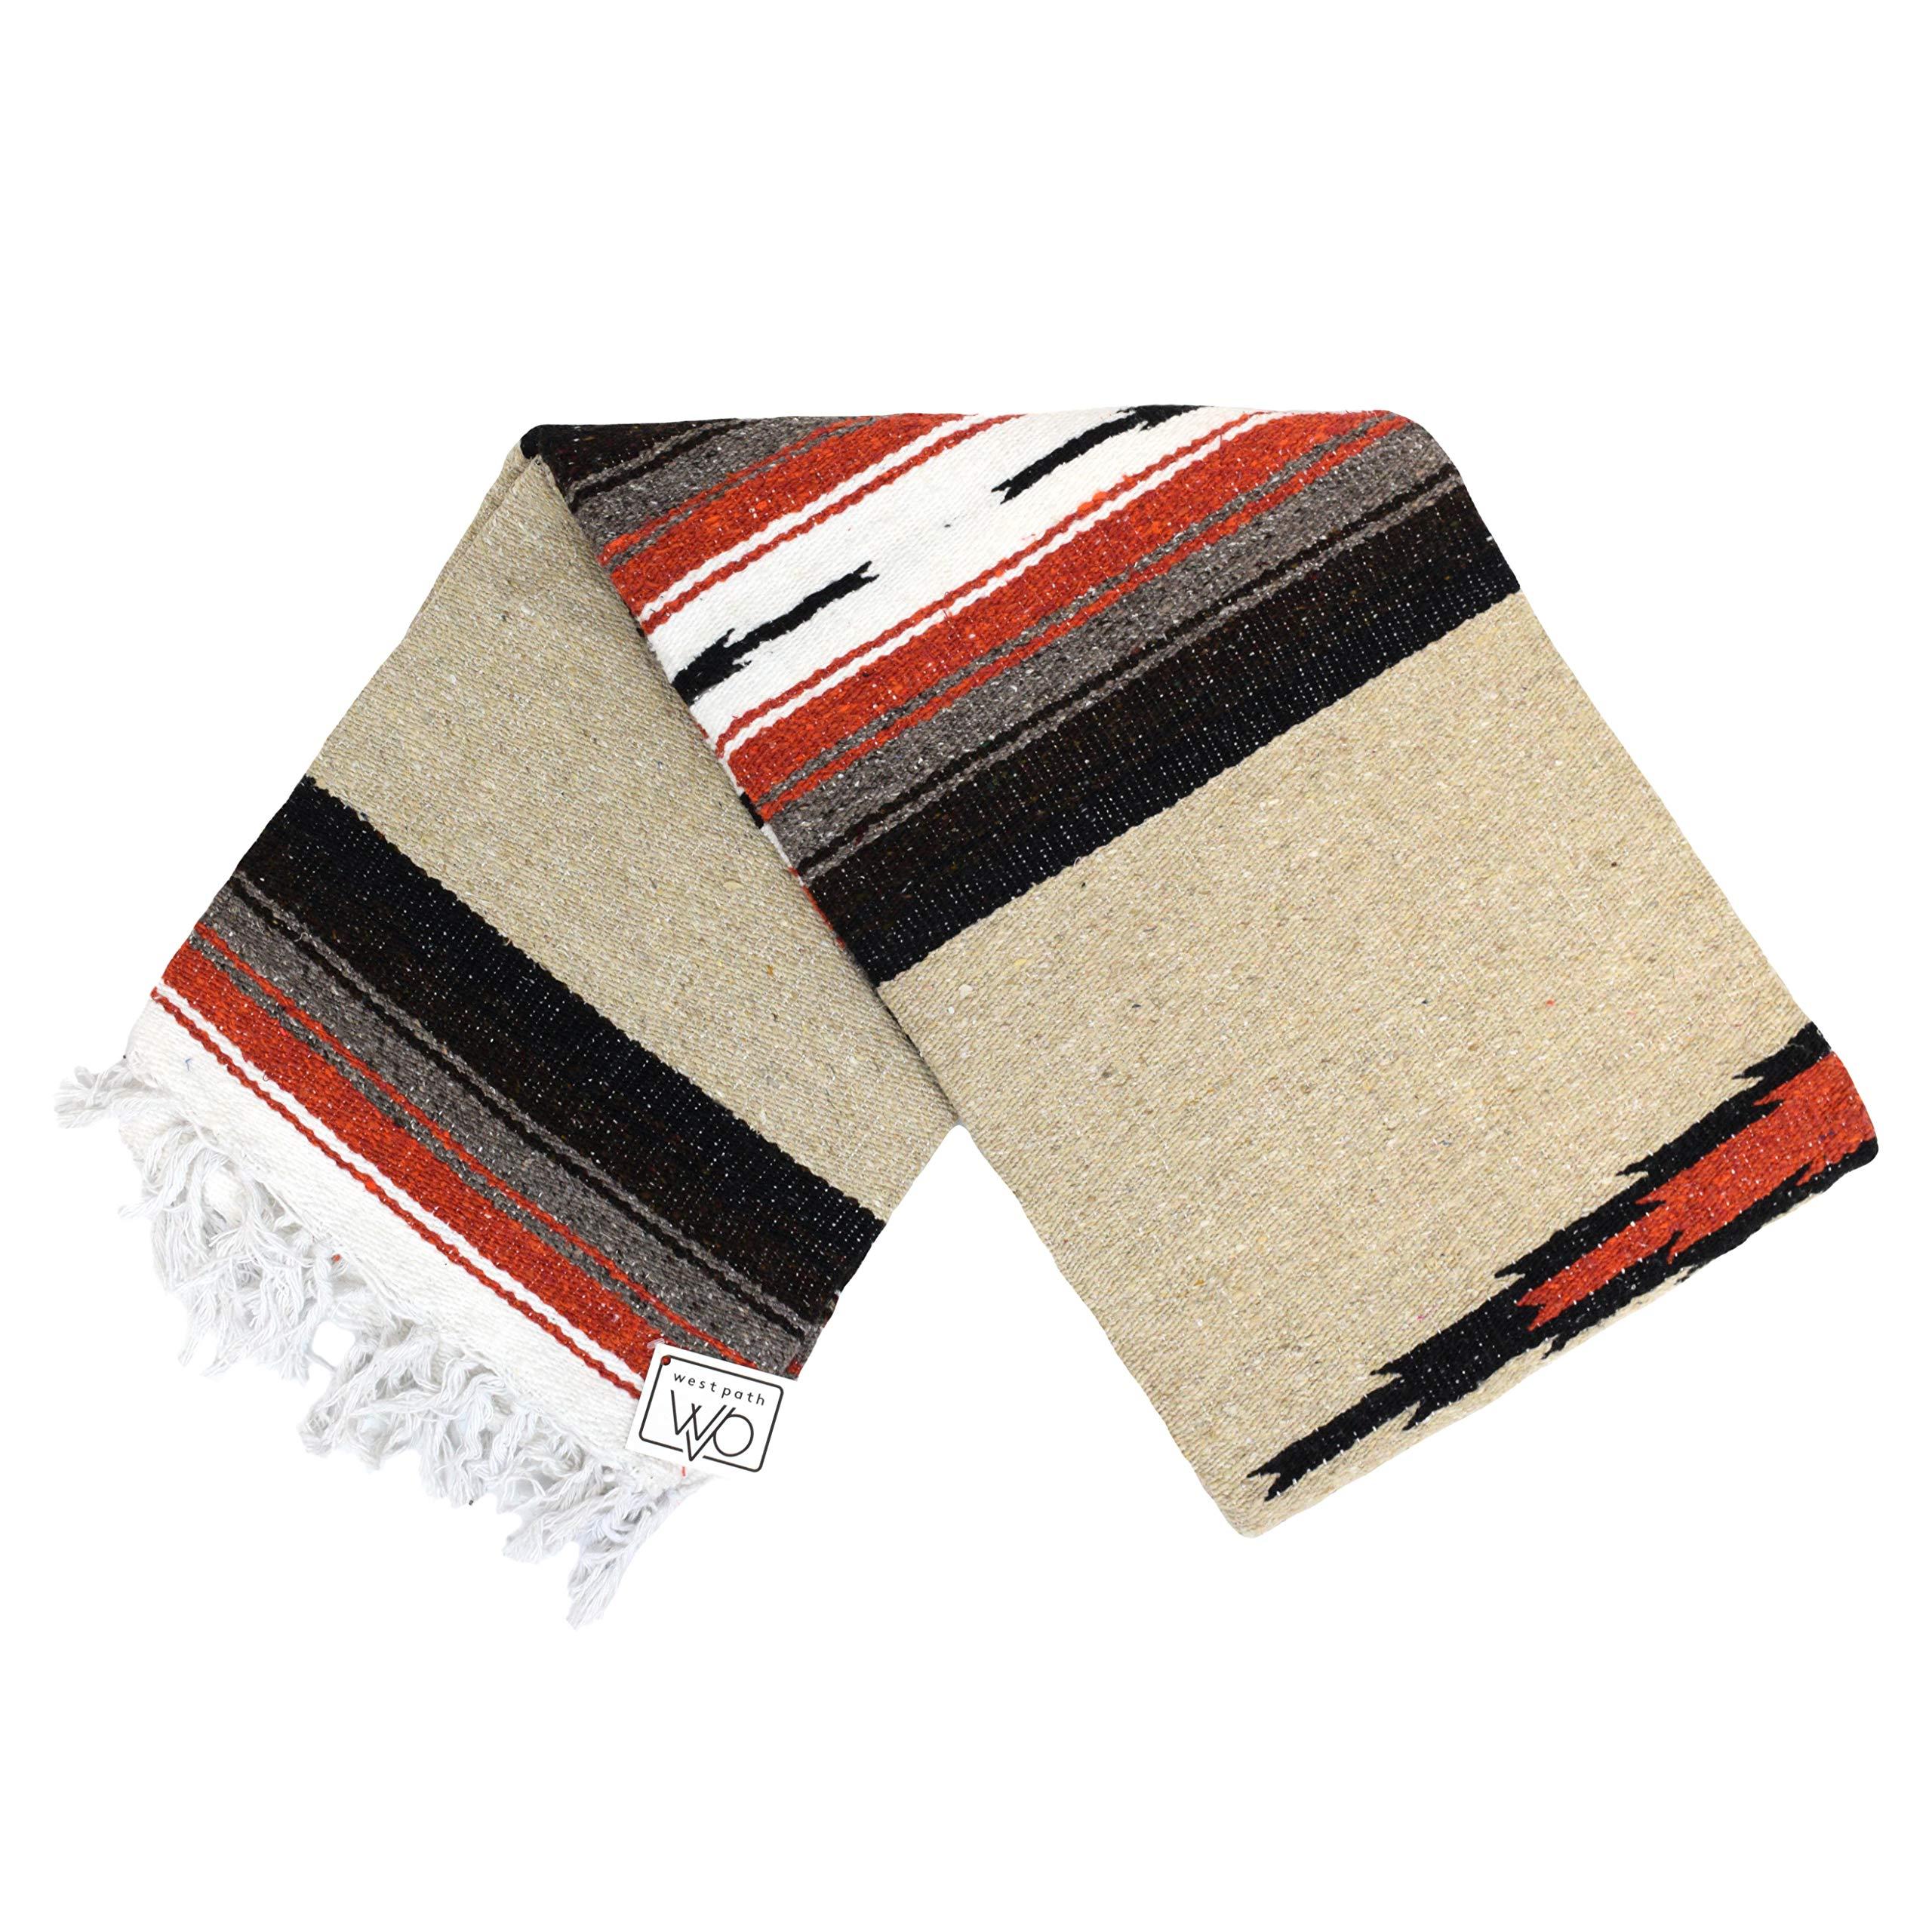 Tan/Khaki Mexican Yoga Blanket - Thick Navajo Diamond Serape with Orange and Brown Stripes